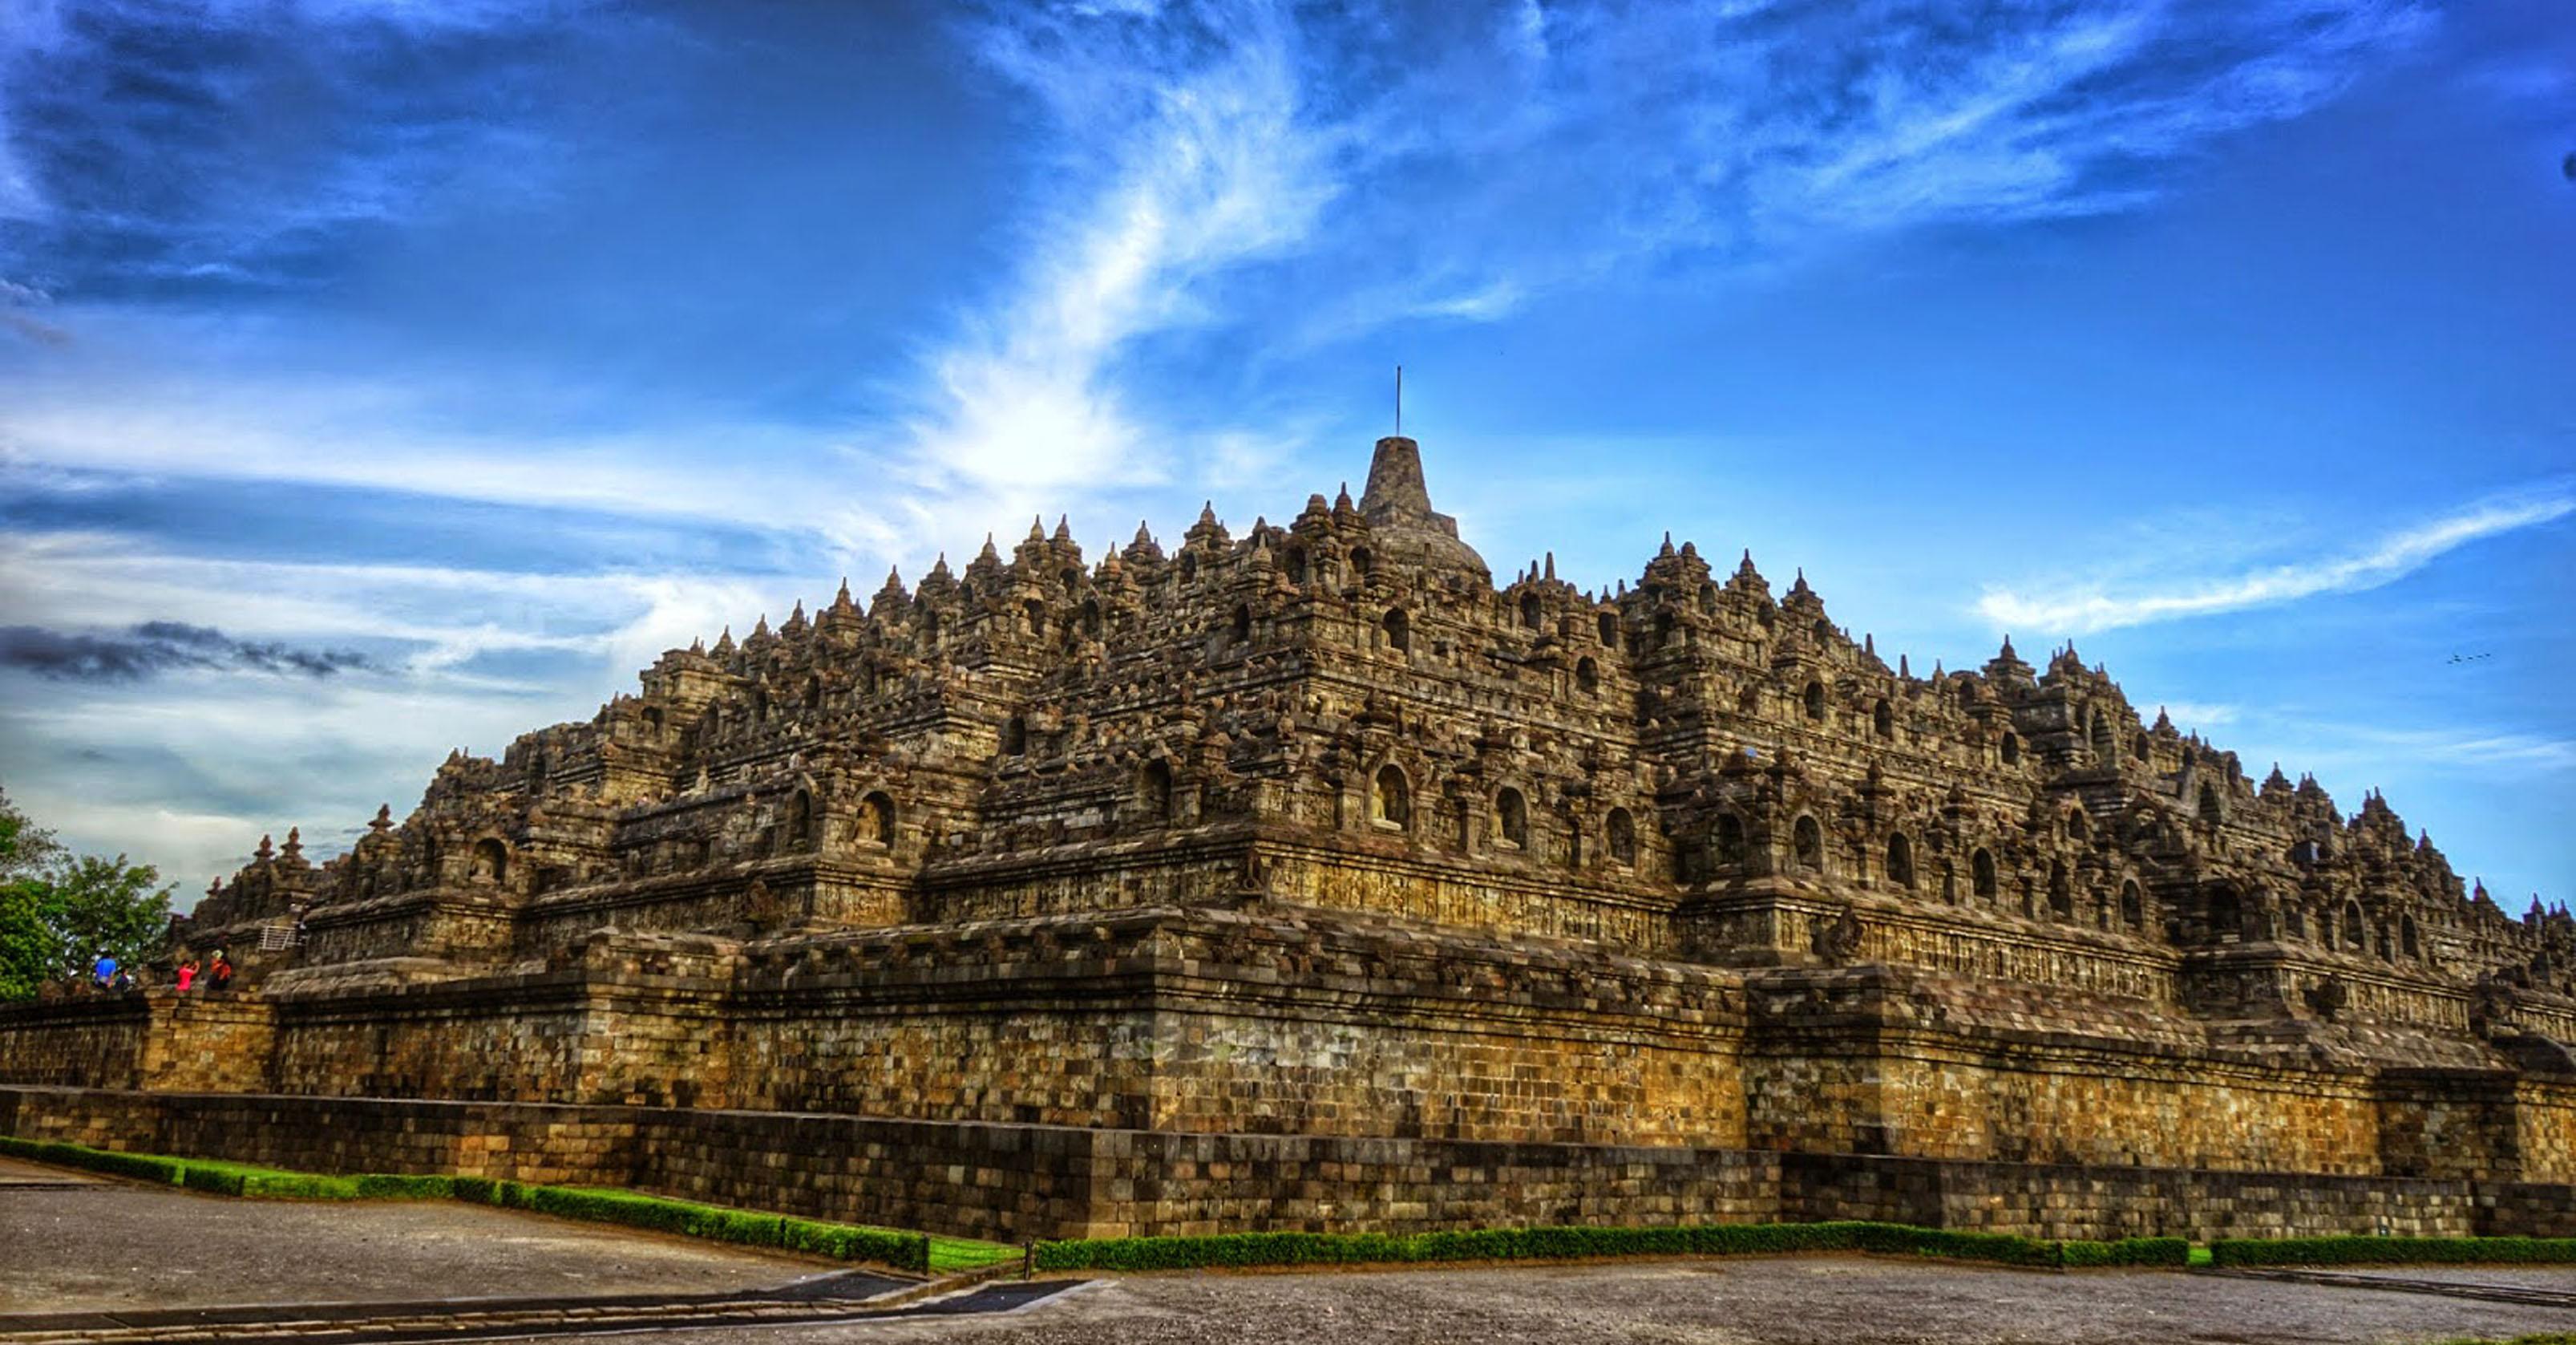 Indonesia Travel Partner Bto Experience Wonders Idjen Boulevard Kab Malang